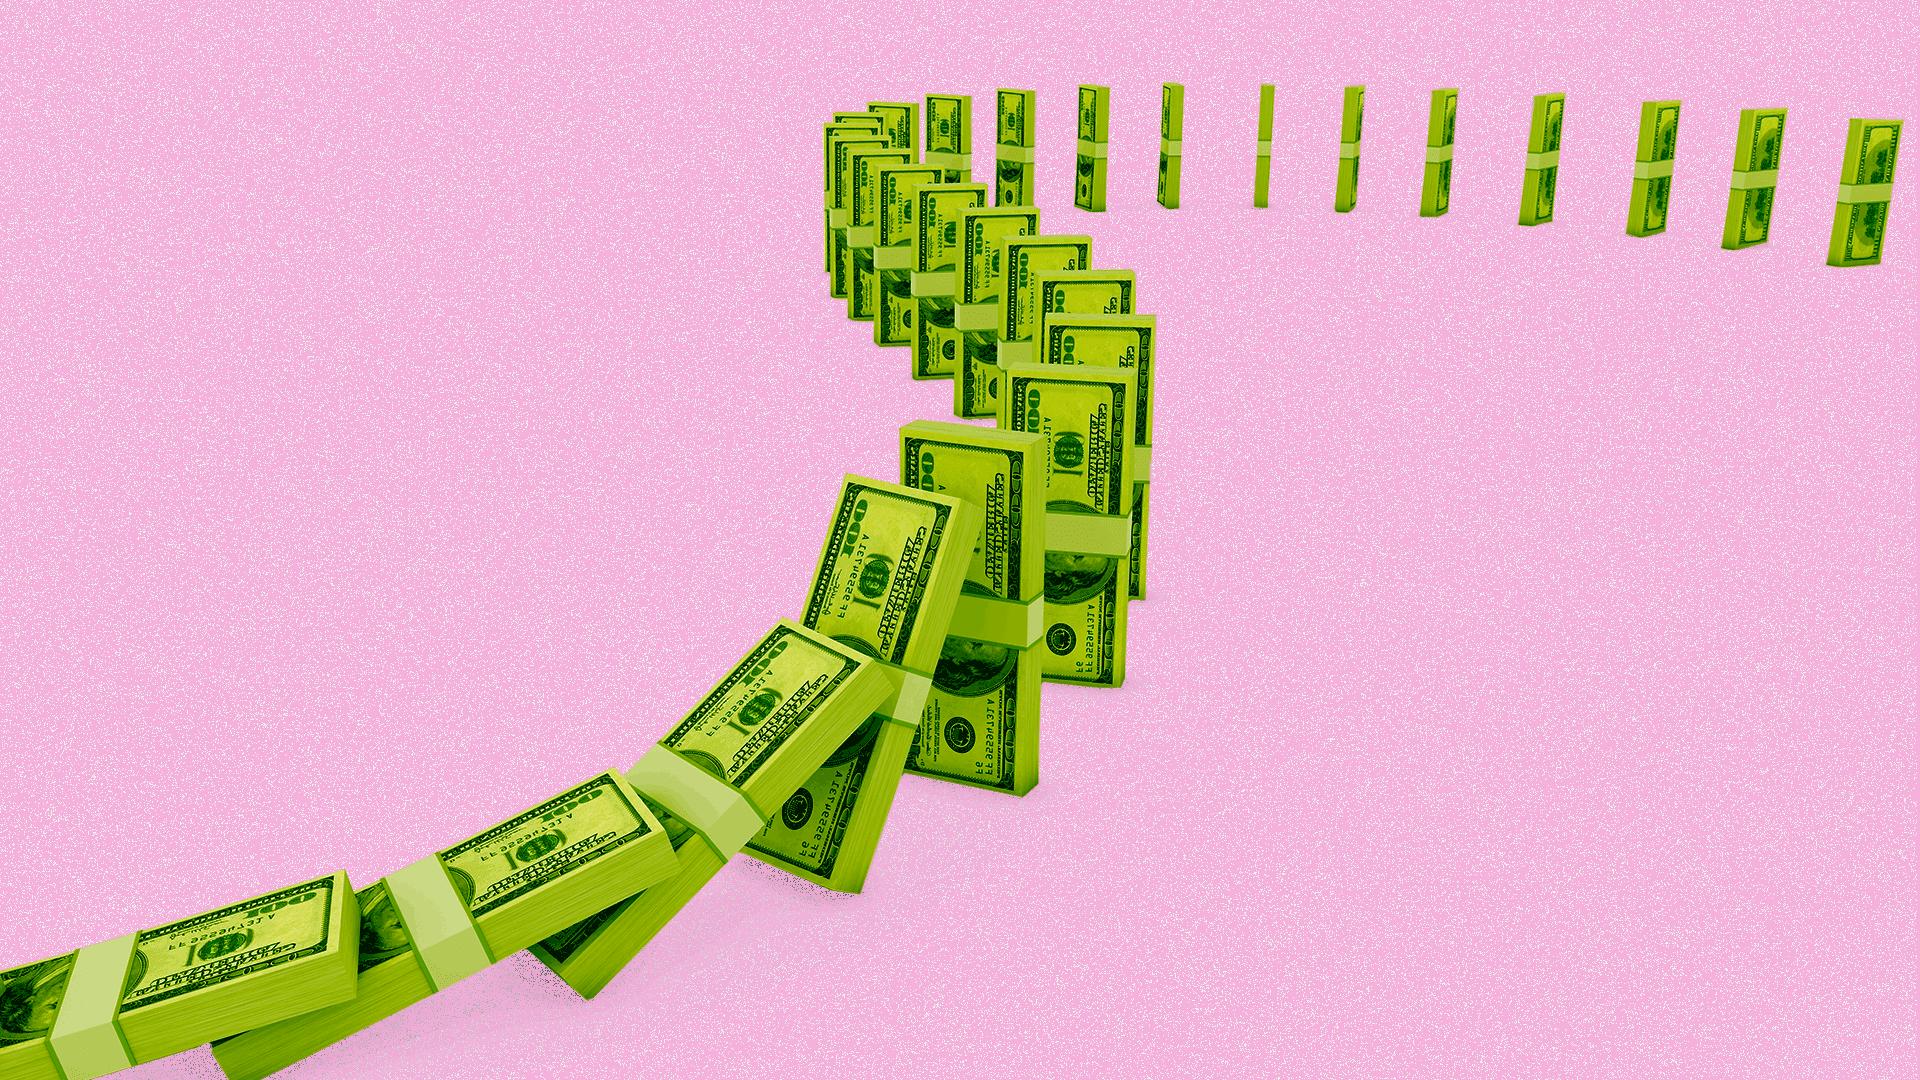 stacks of money falling down like dominoes